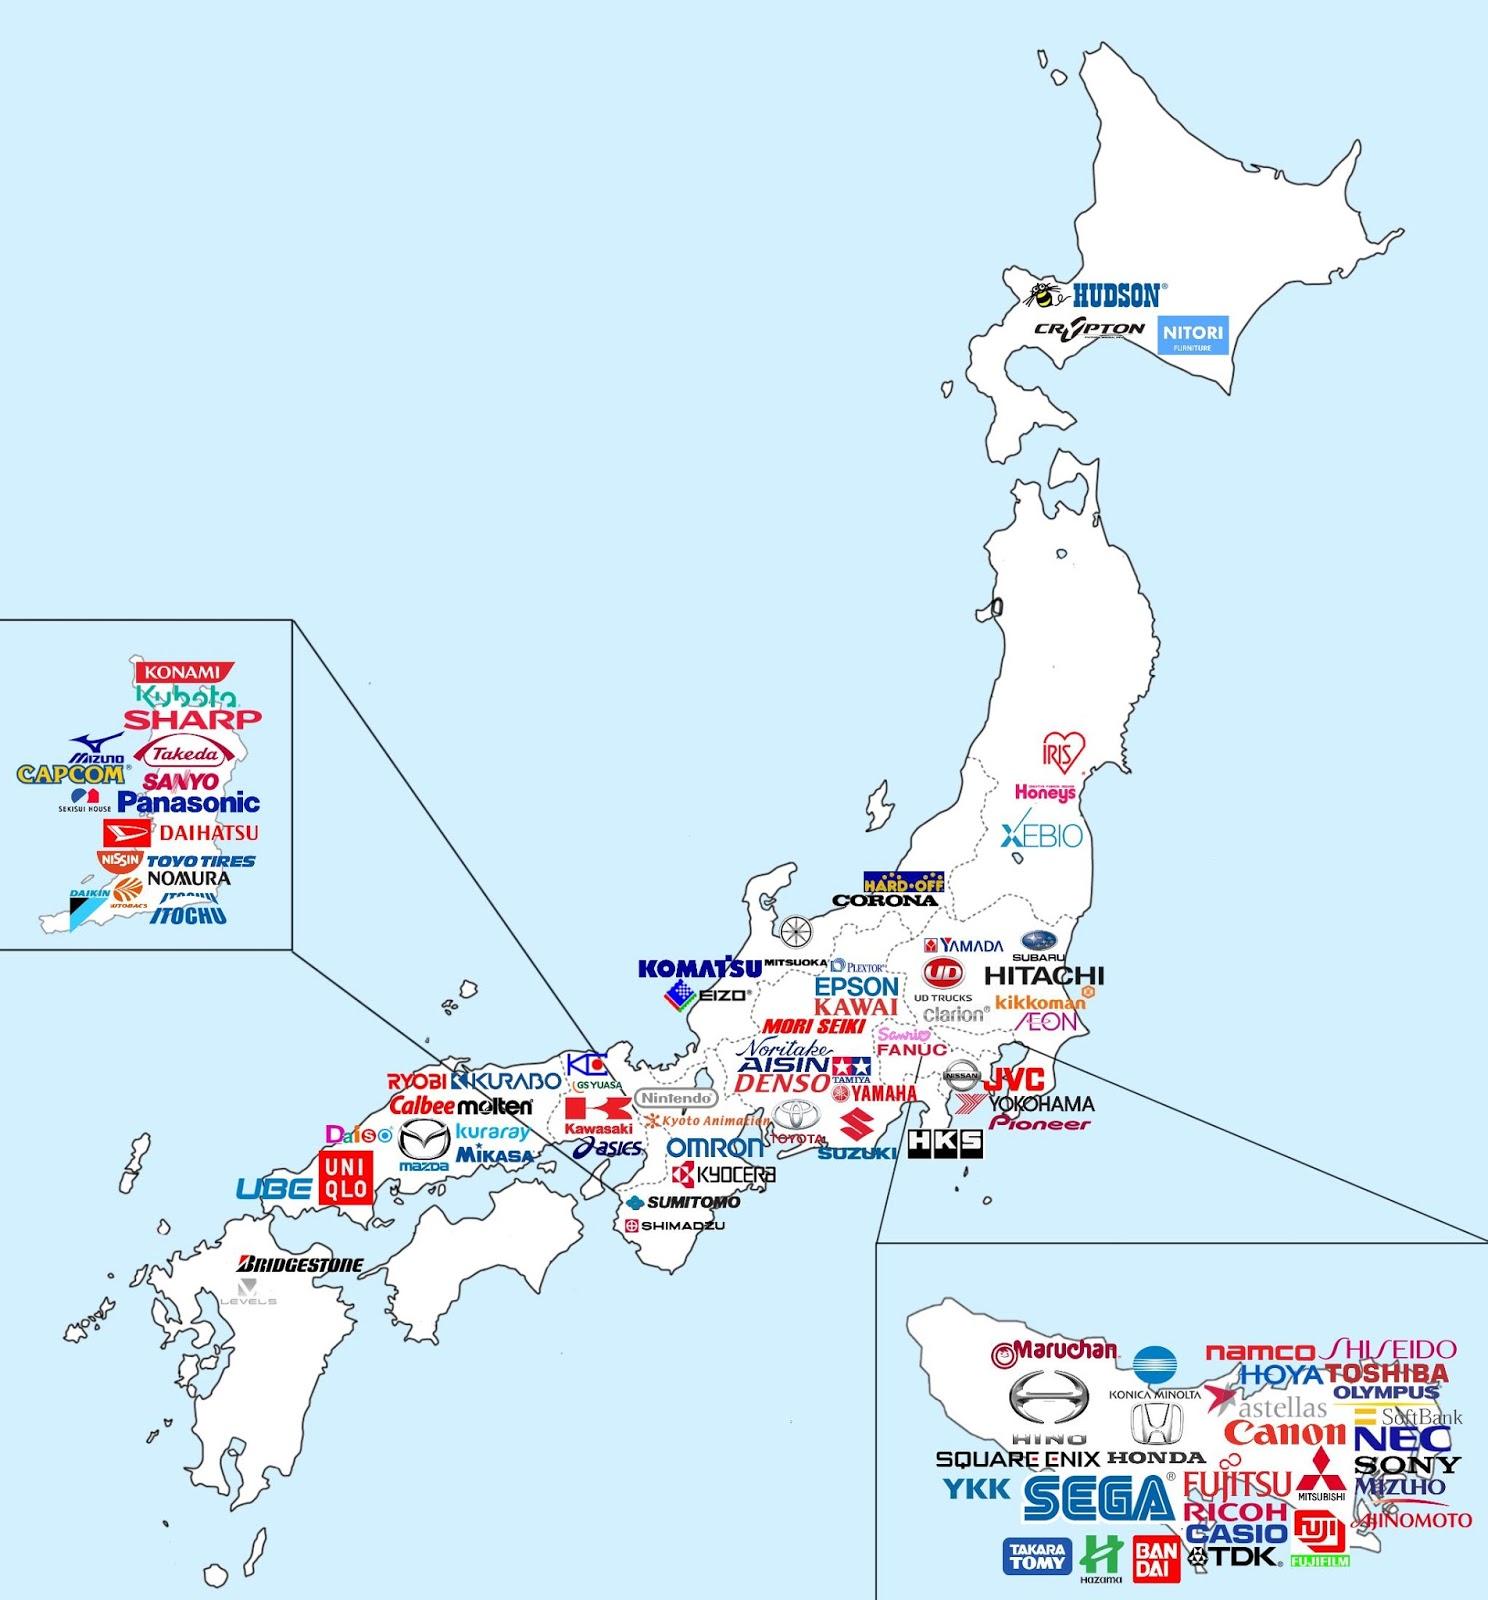 Major Japanese companies map